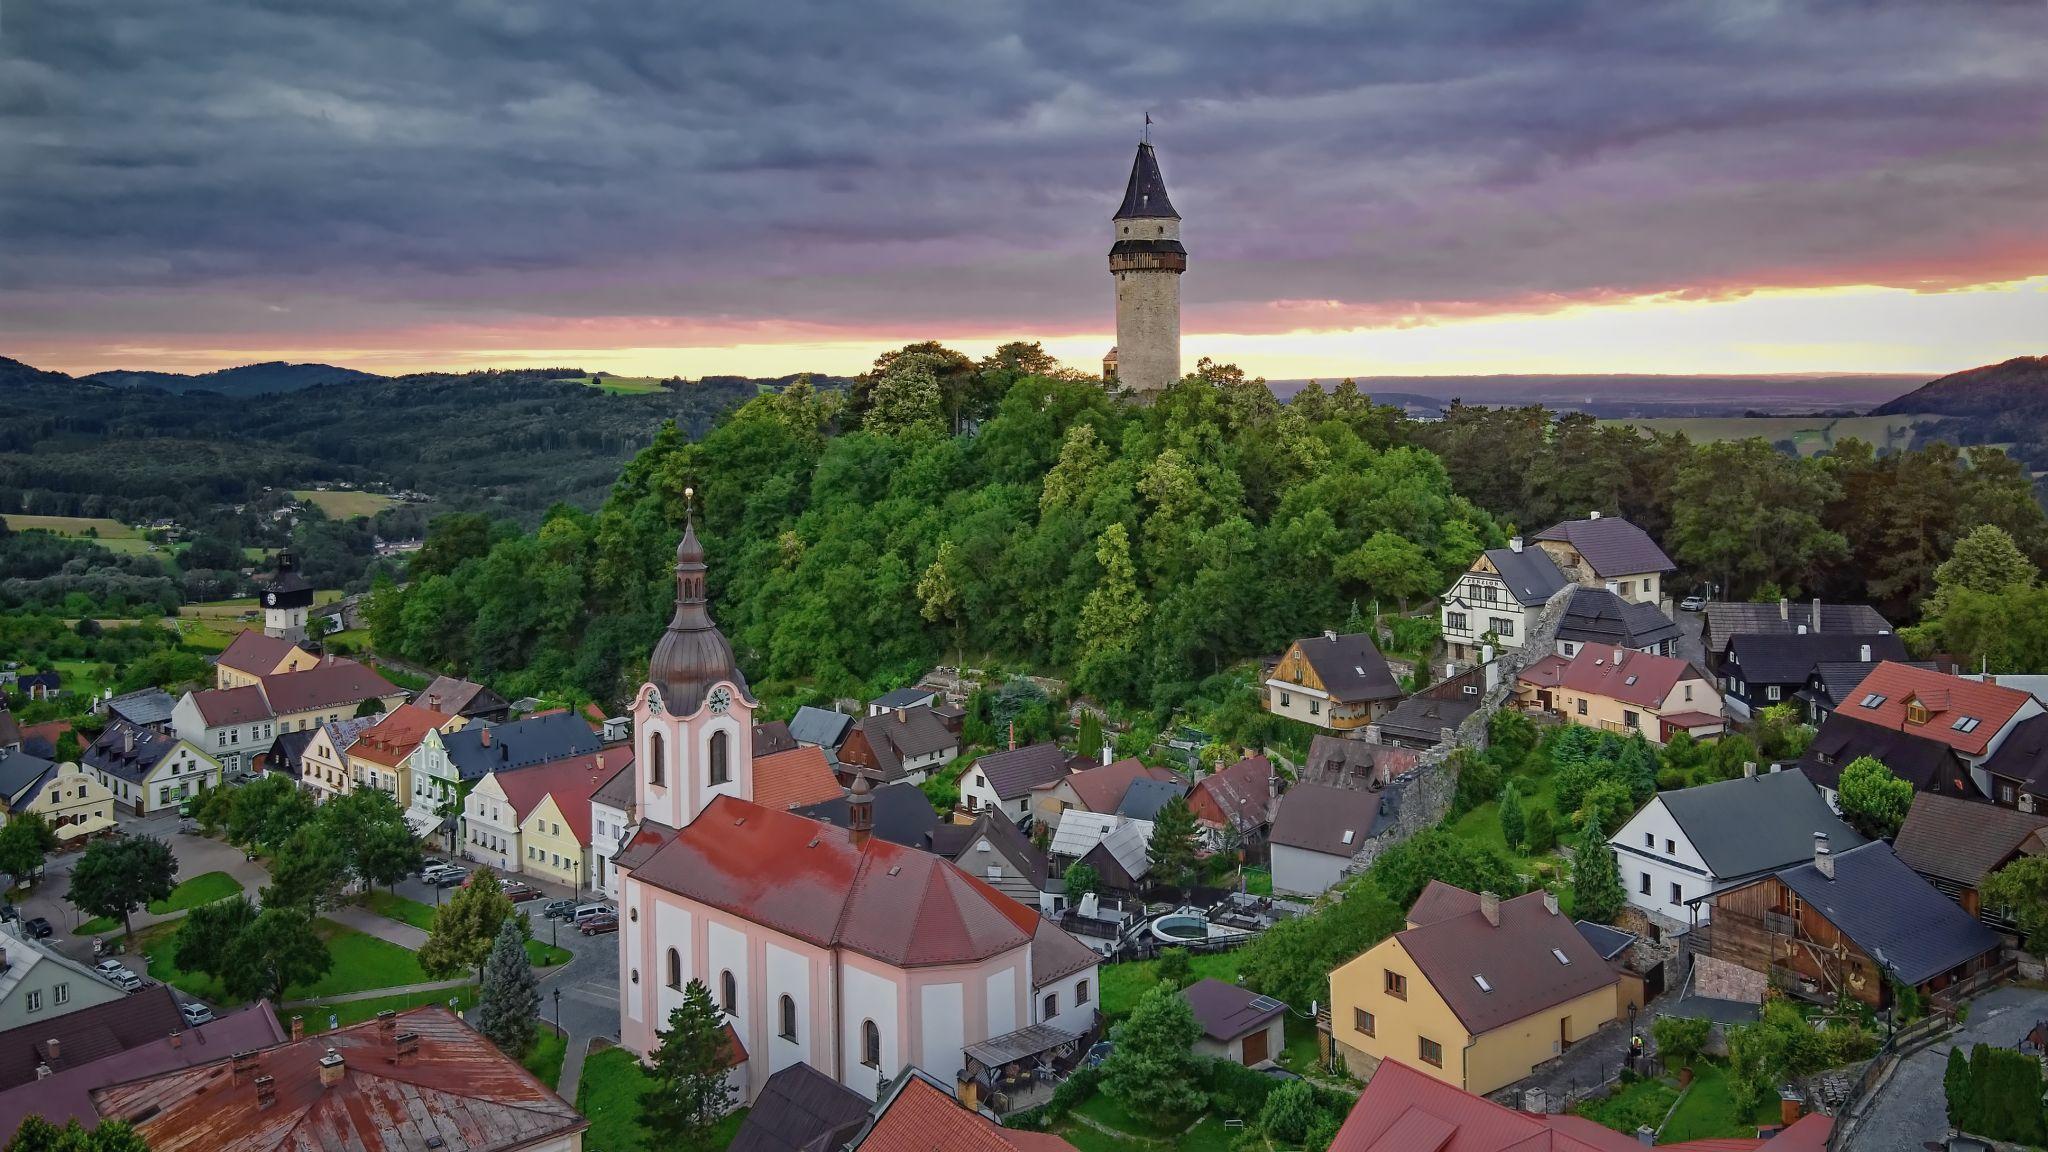 Štramberská Trúba, Czech Republic